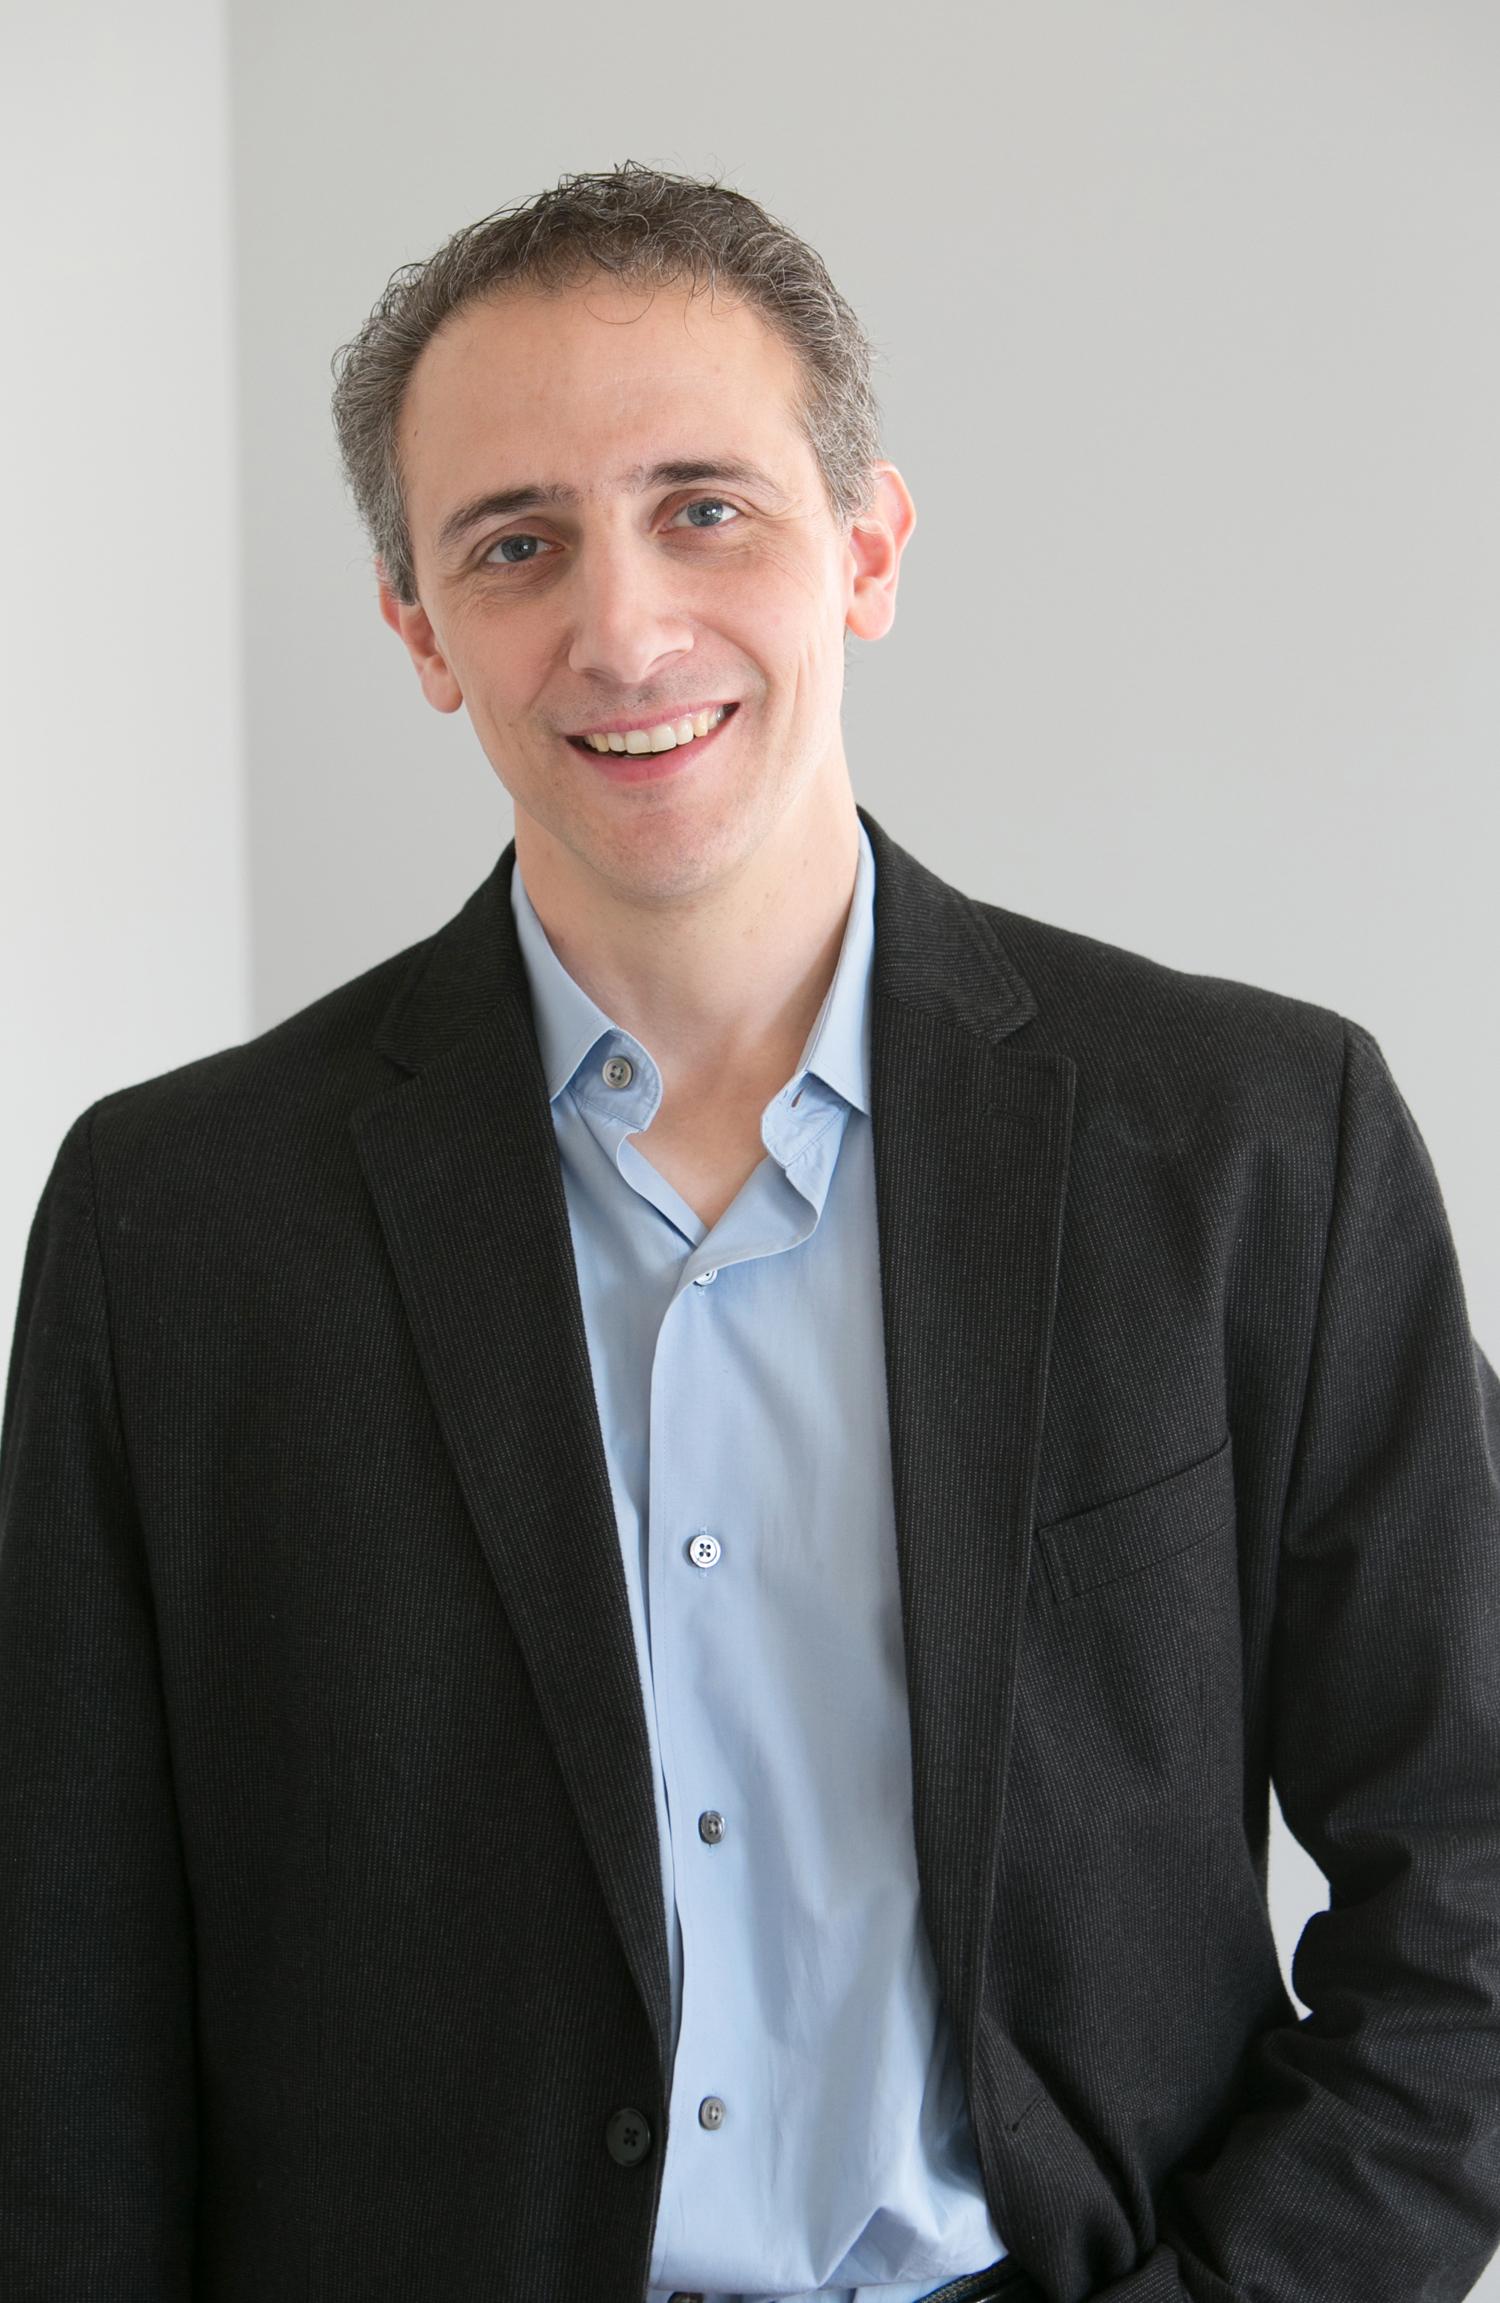 Darren China, Architect, Founding Partner